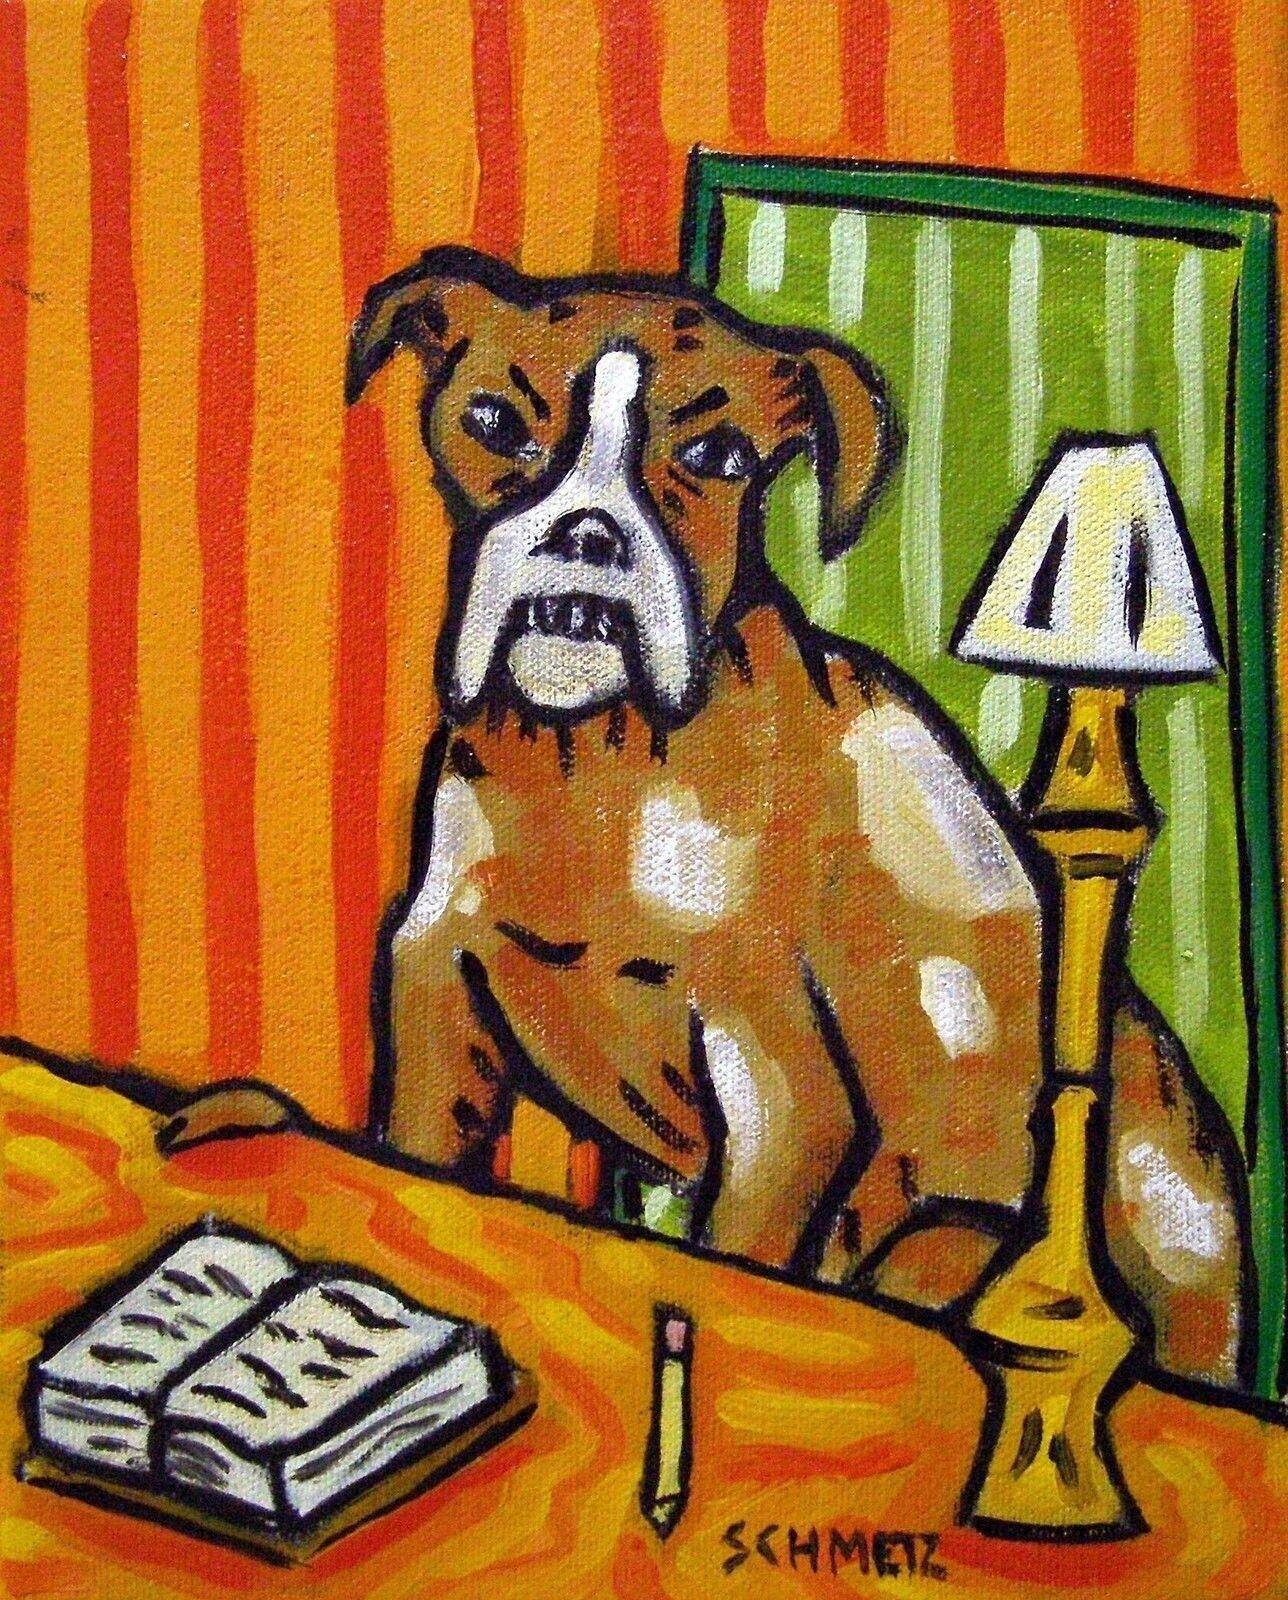 boxer dog pet salon bathroom wall art 11x14  art art PRINT animals new